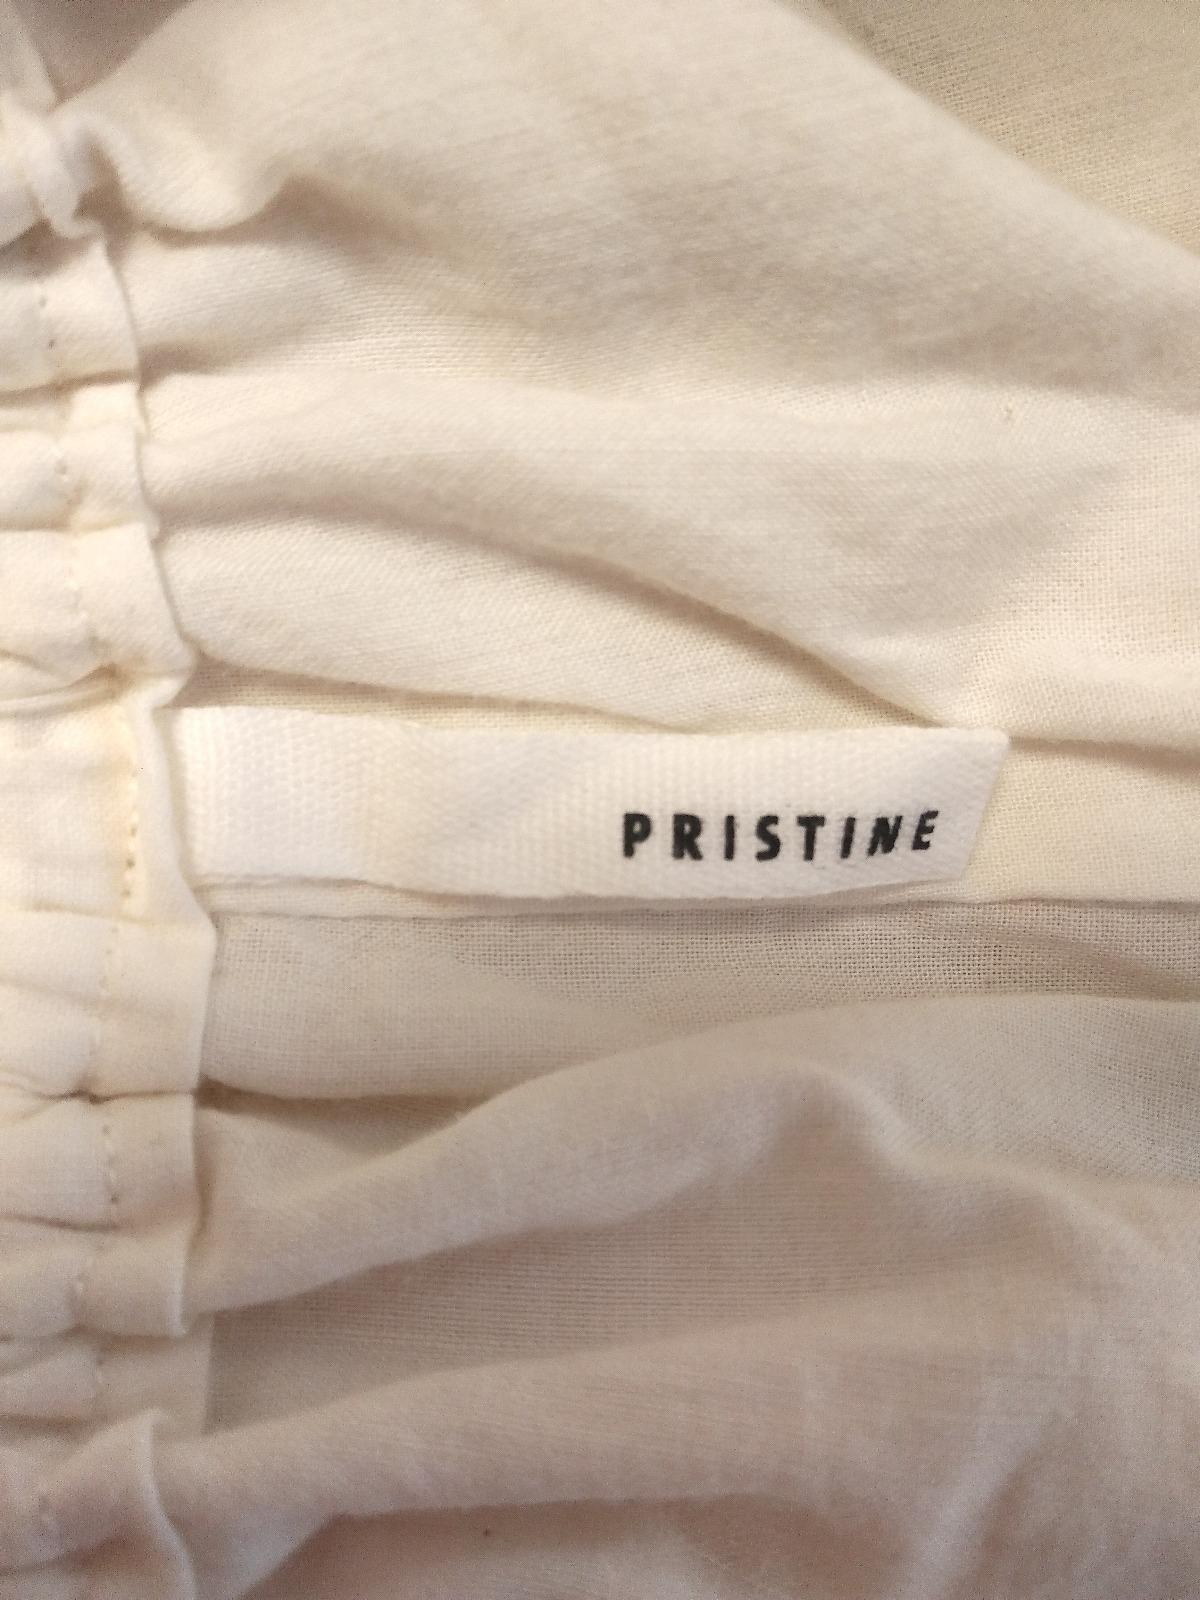 pristine(プリスティン)のパンツ